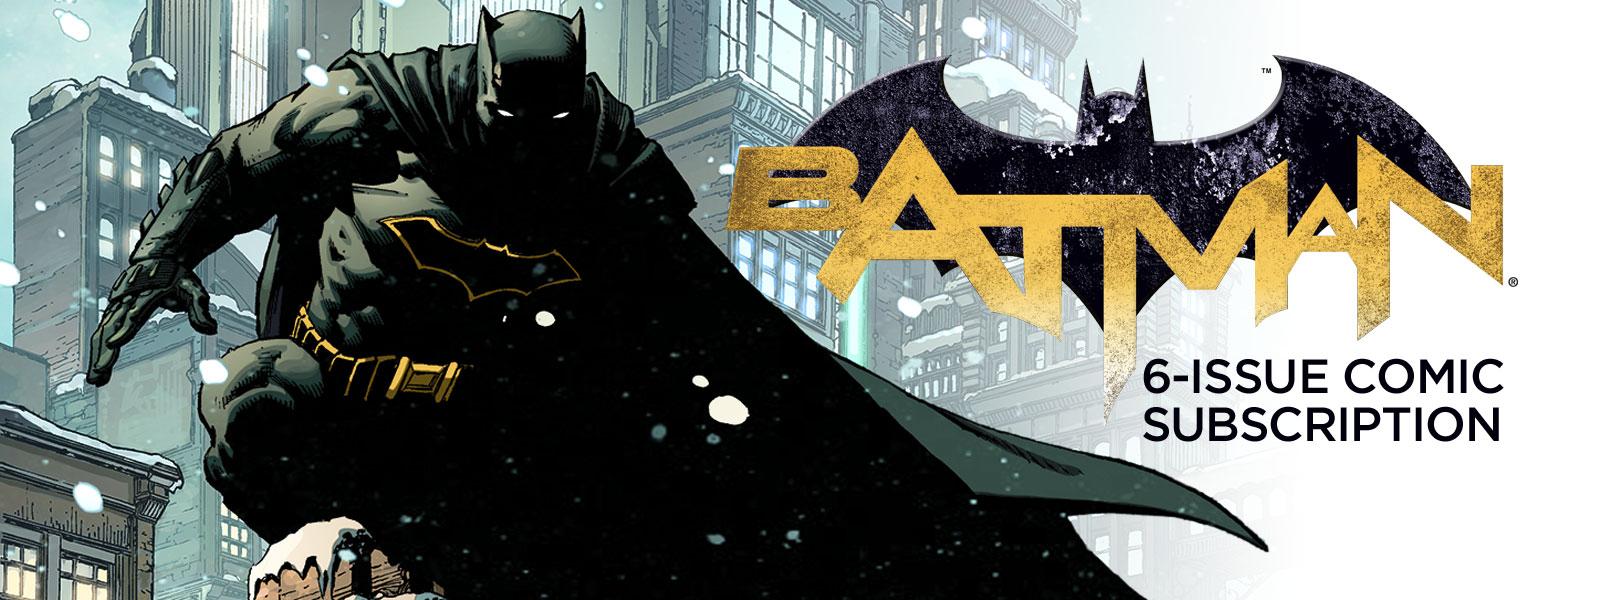 6-Issue Subscription Promo: Batman